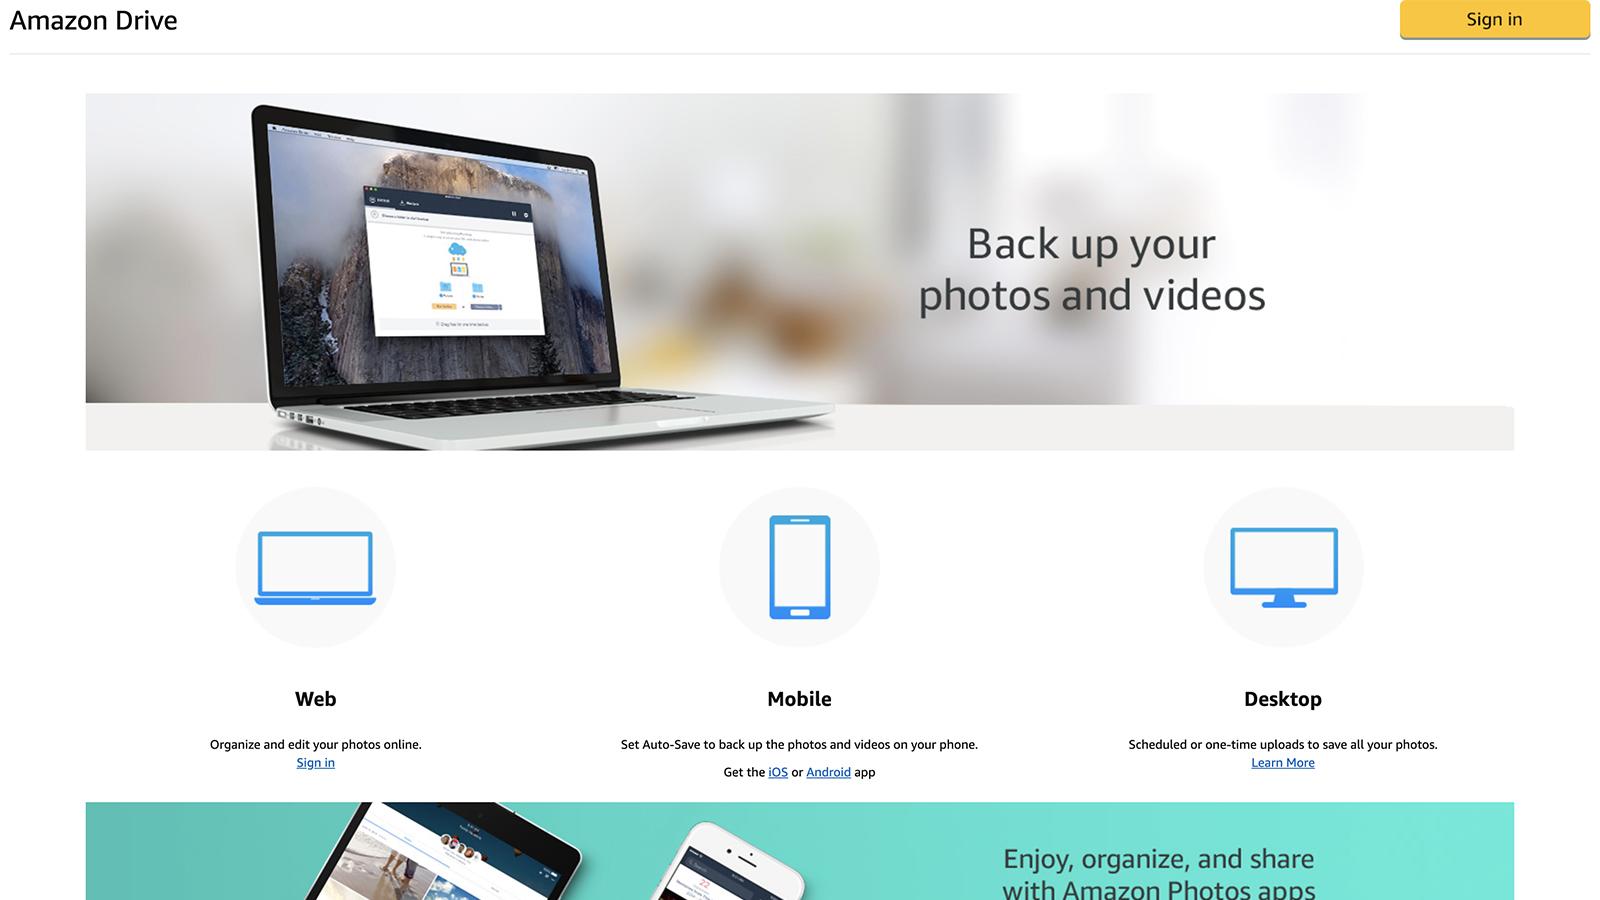 Screenshot of Amazon Drive